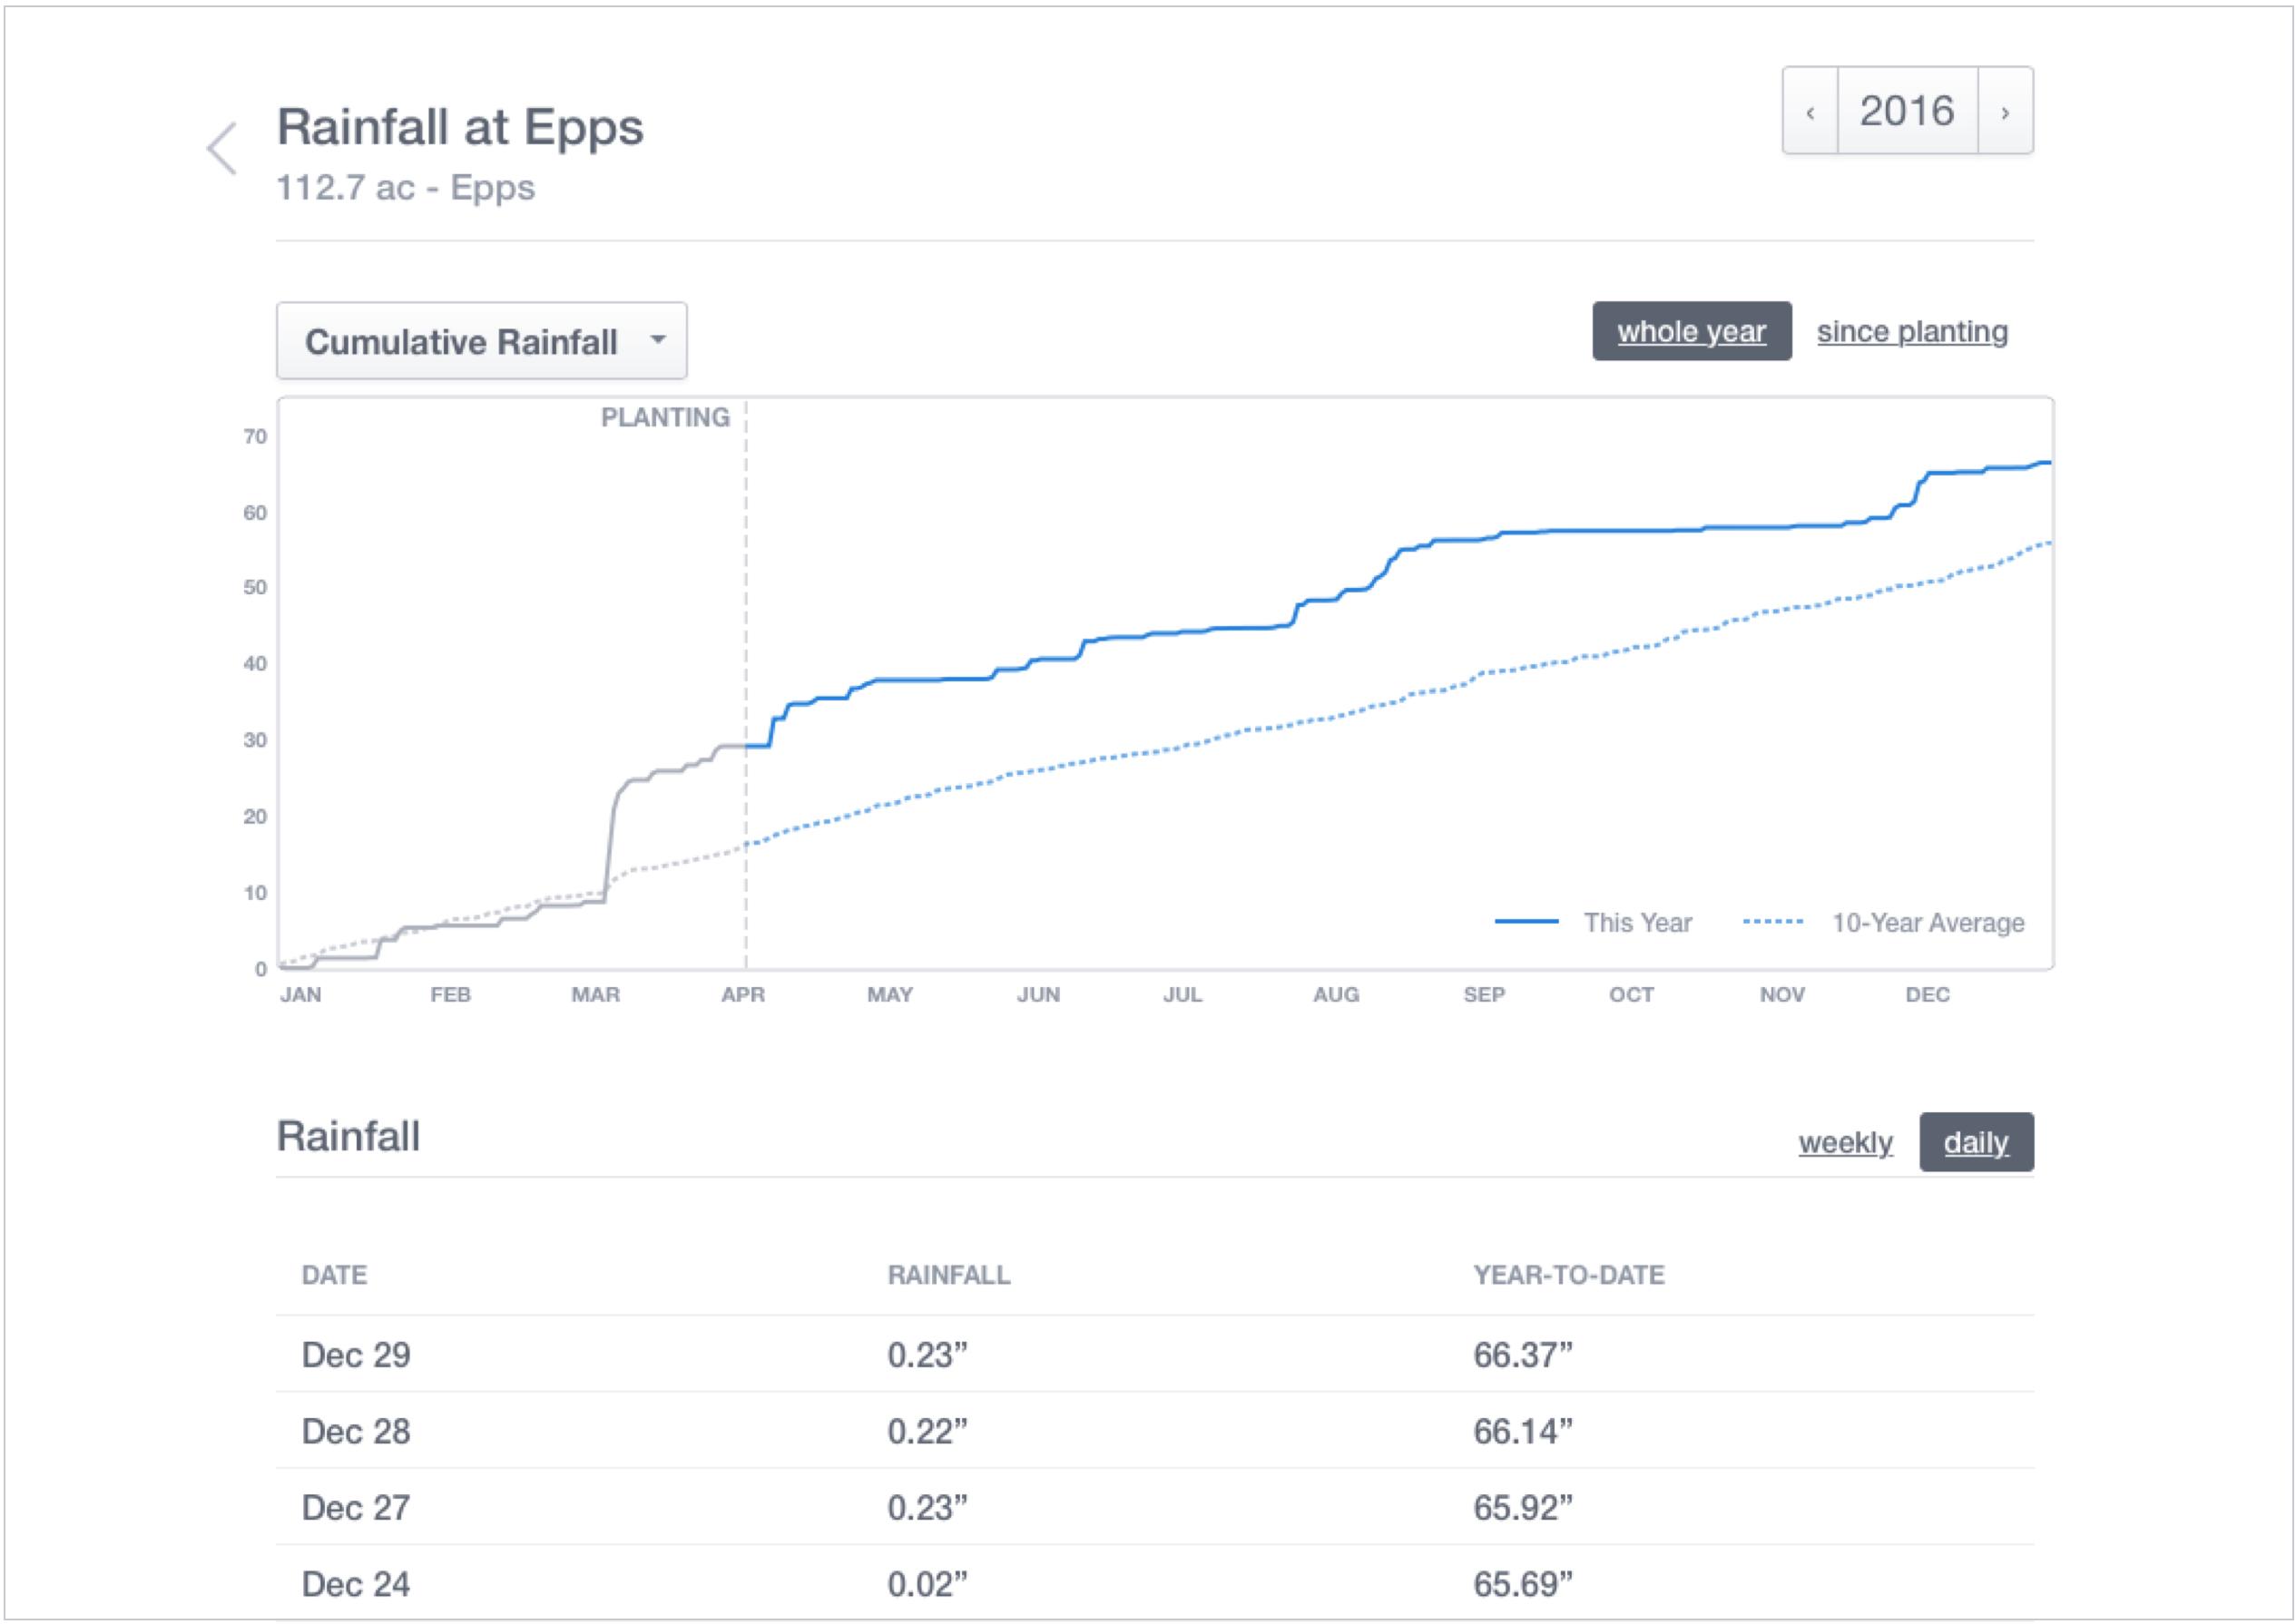 Desktop view of Rainfall Tracking in Walker's FarmLogs account